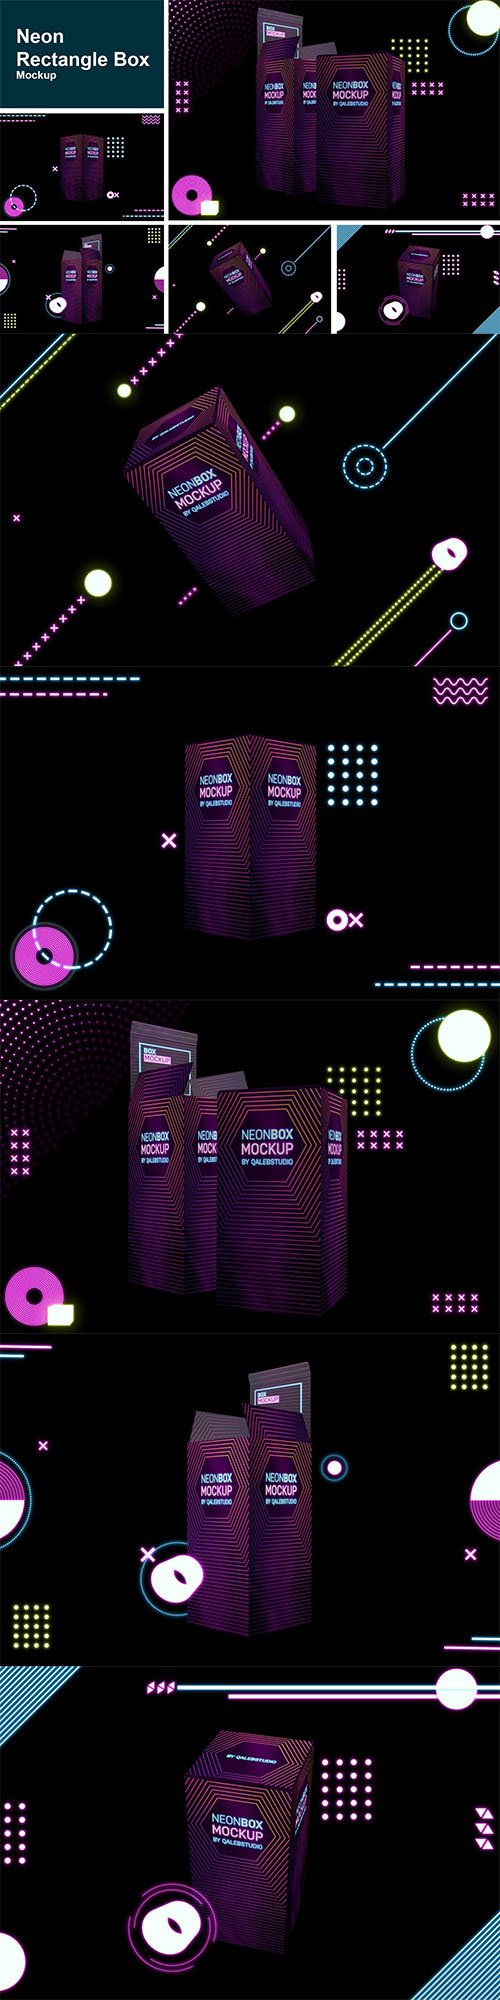 Neon Rectangle Box Mockup